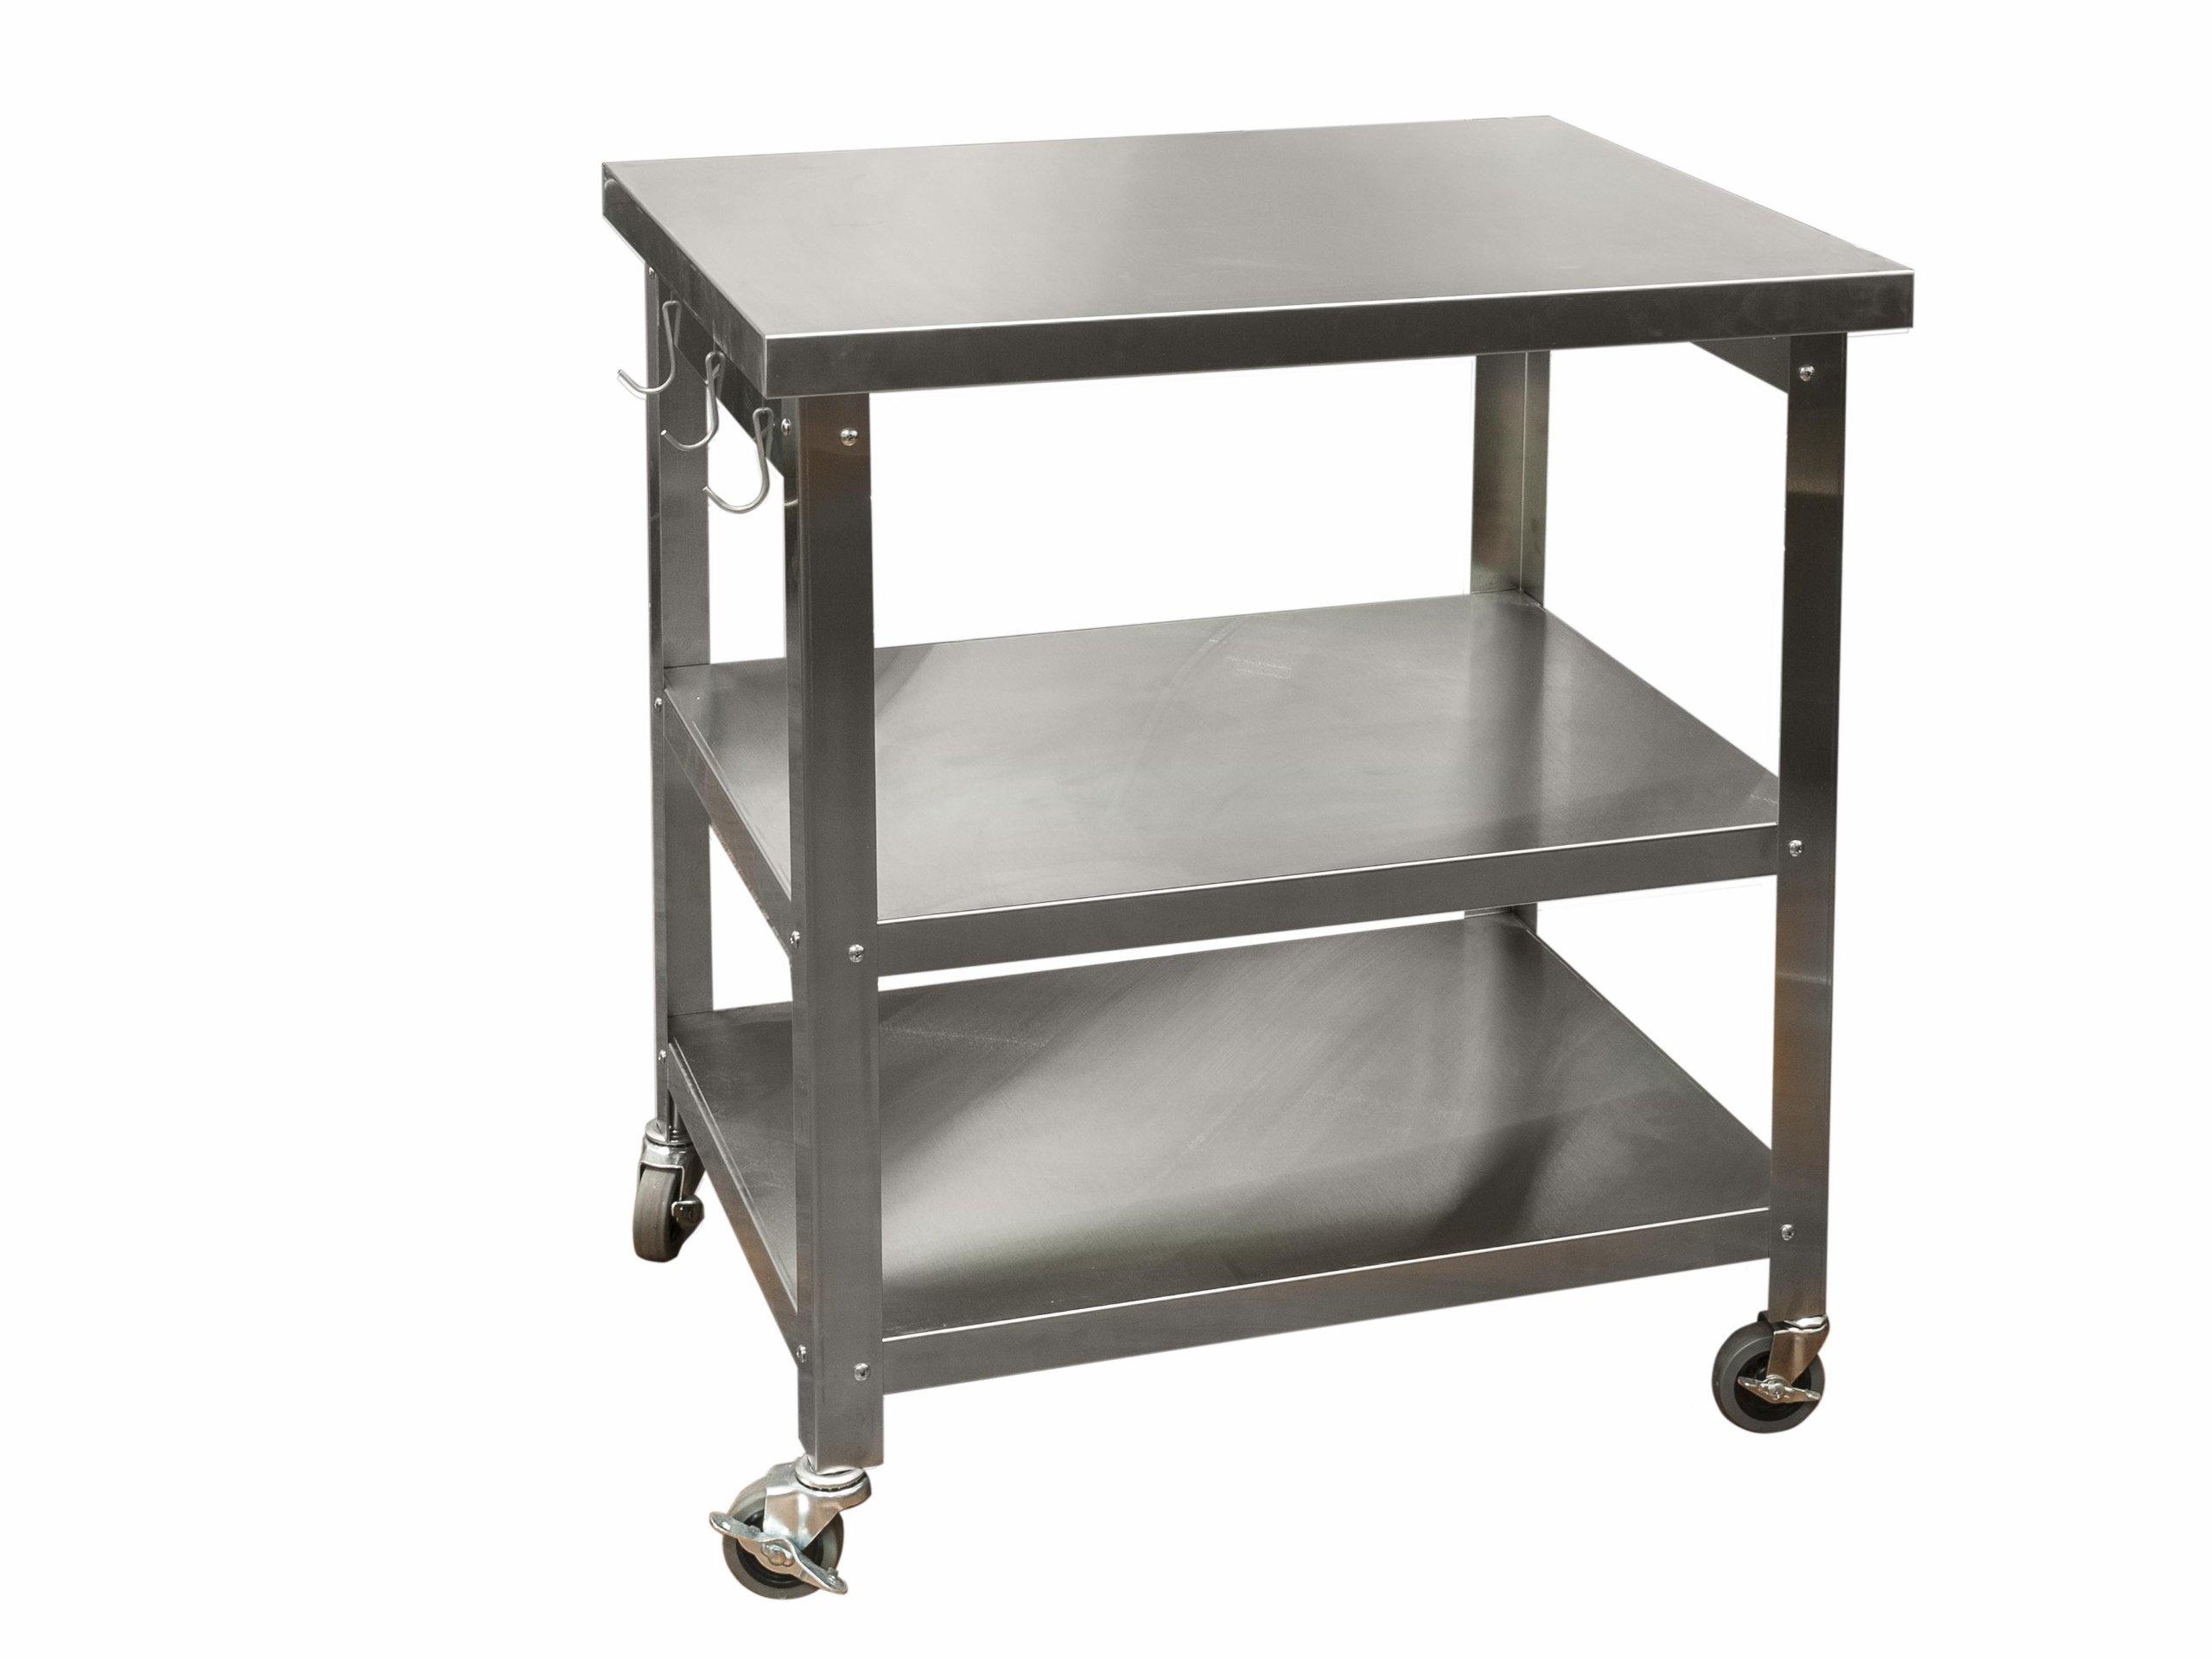 Danver Stainless Steel Kitchen Cart, 30-Inch